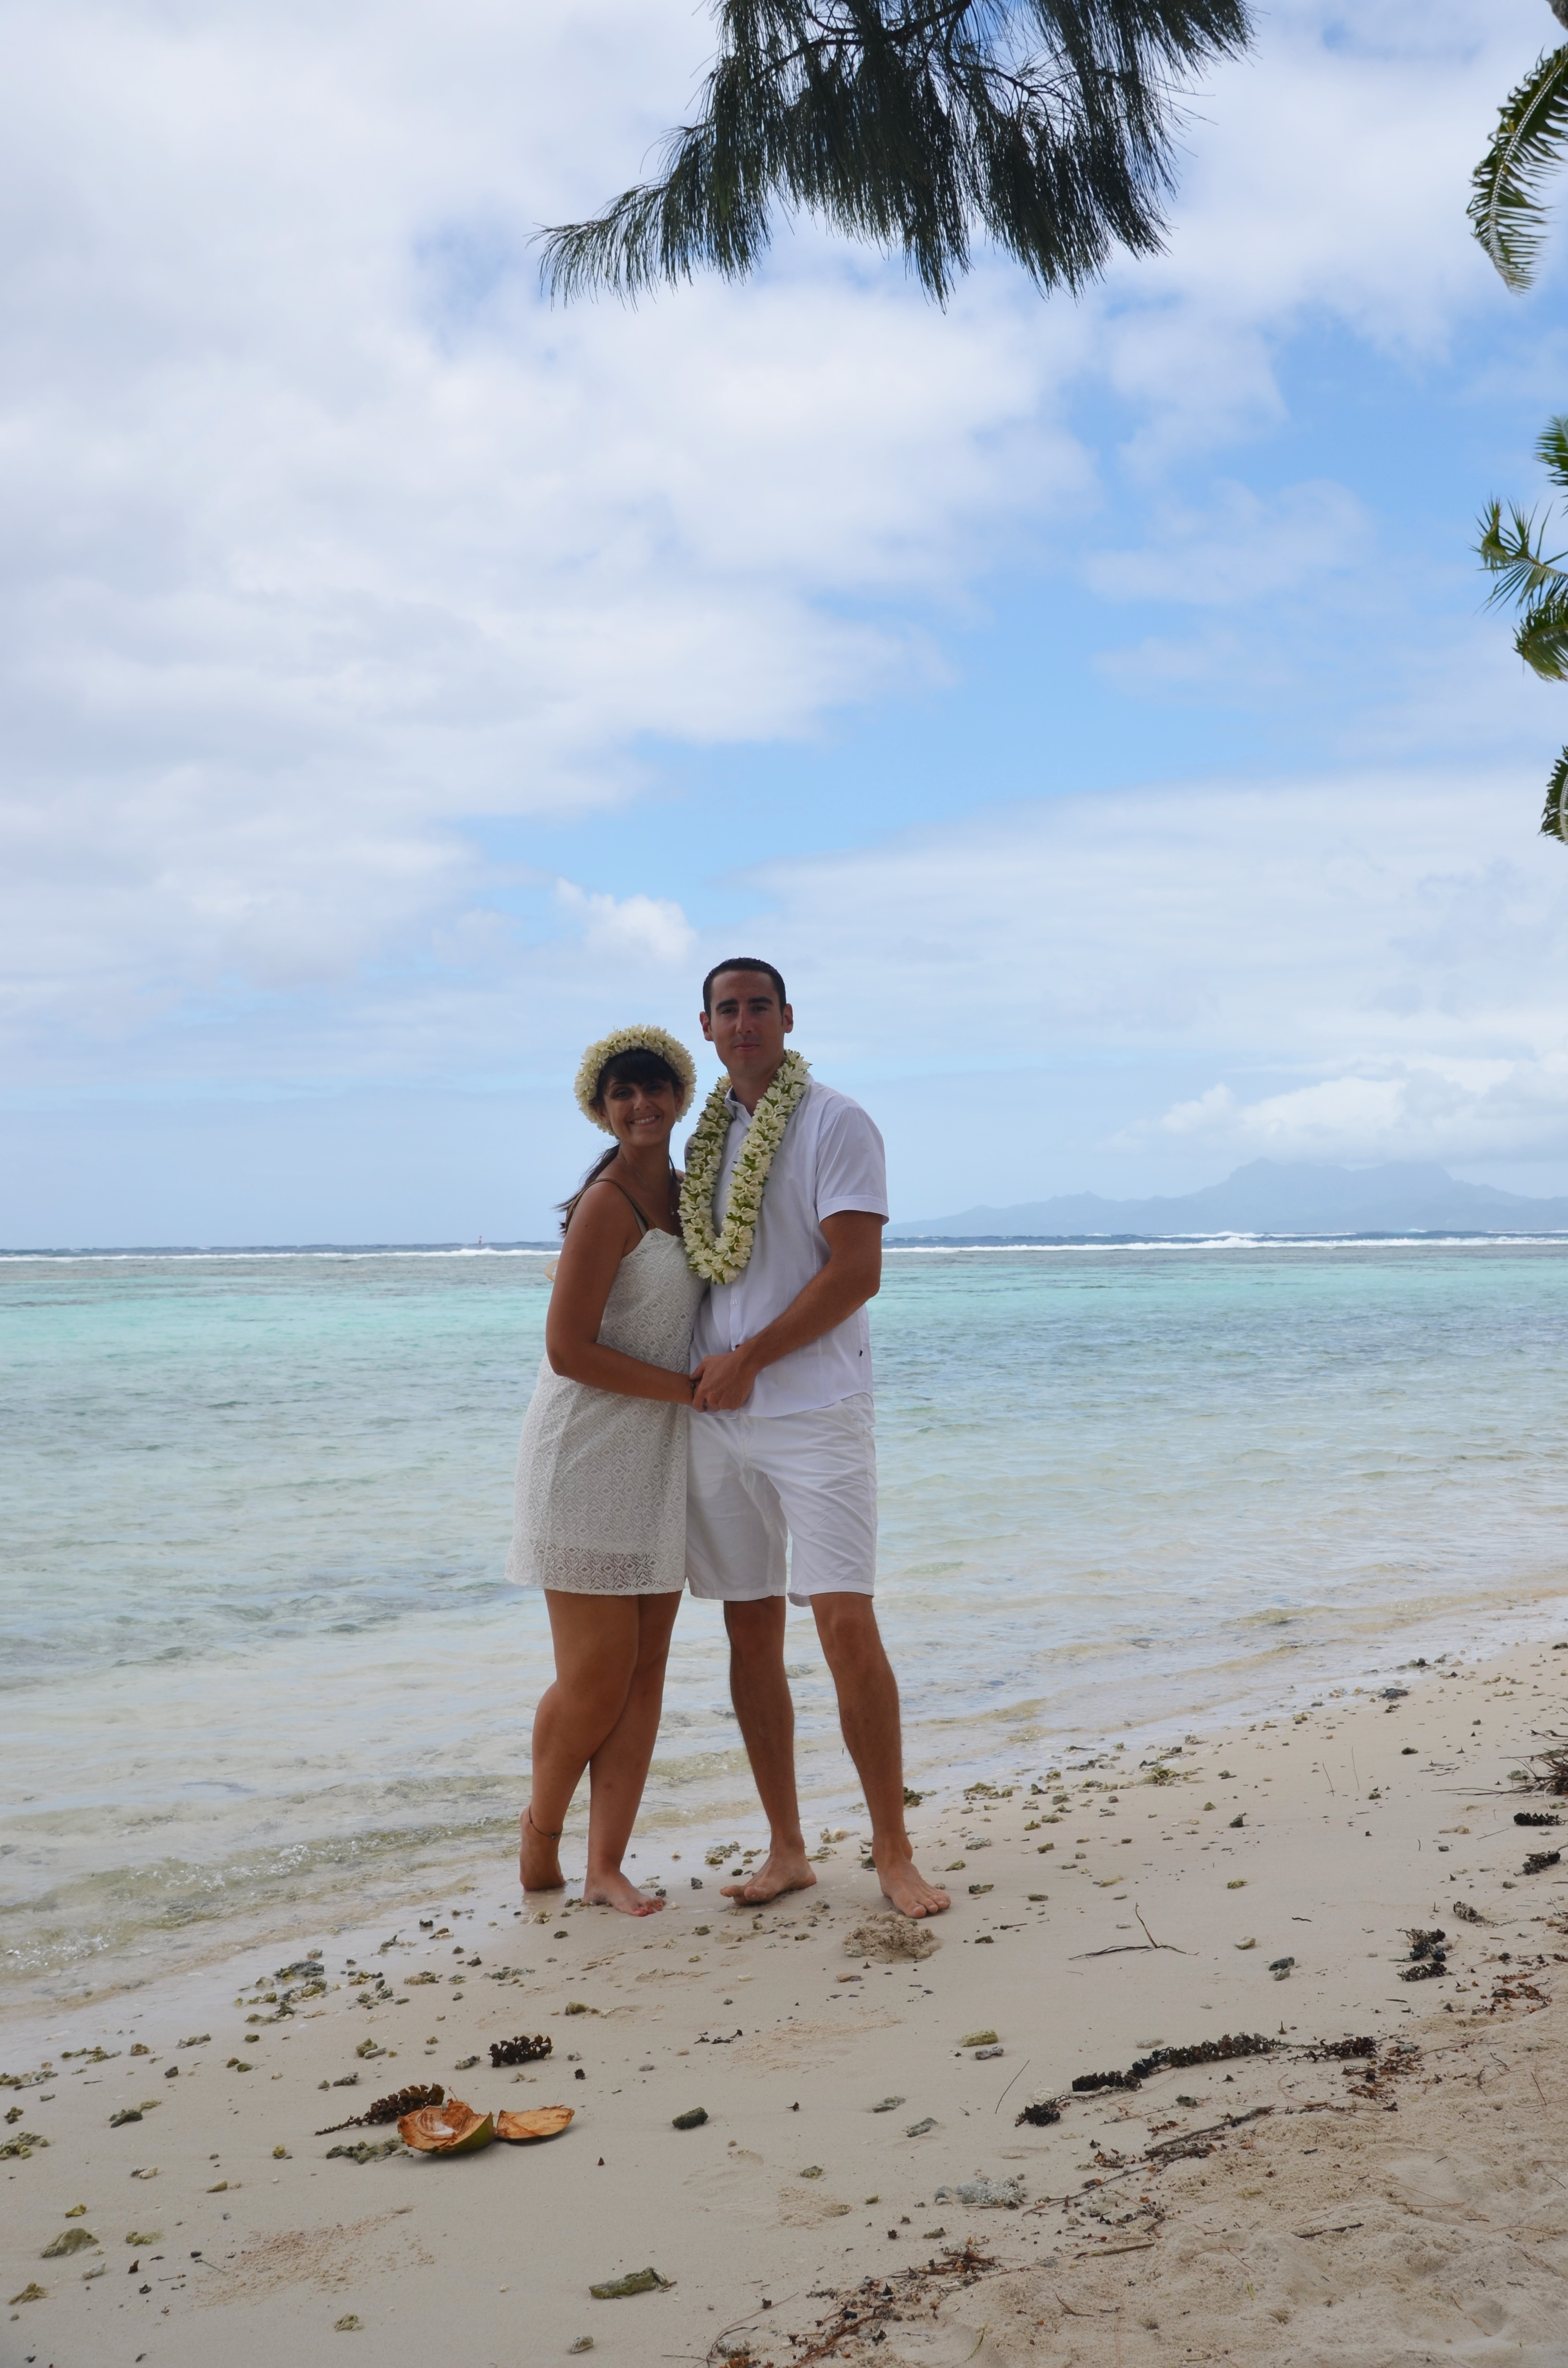 Mariage traditionnel en Polynésie Le bonheur